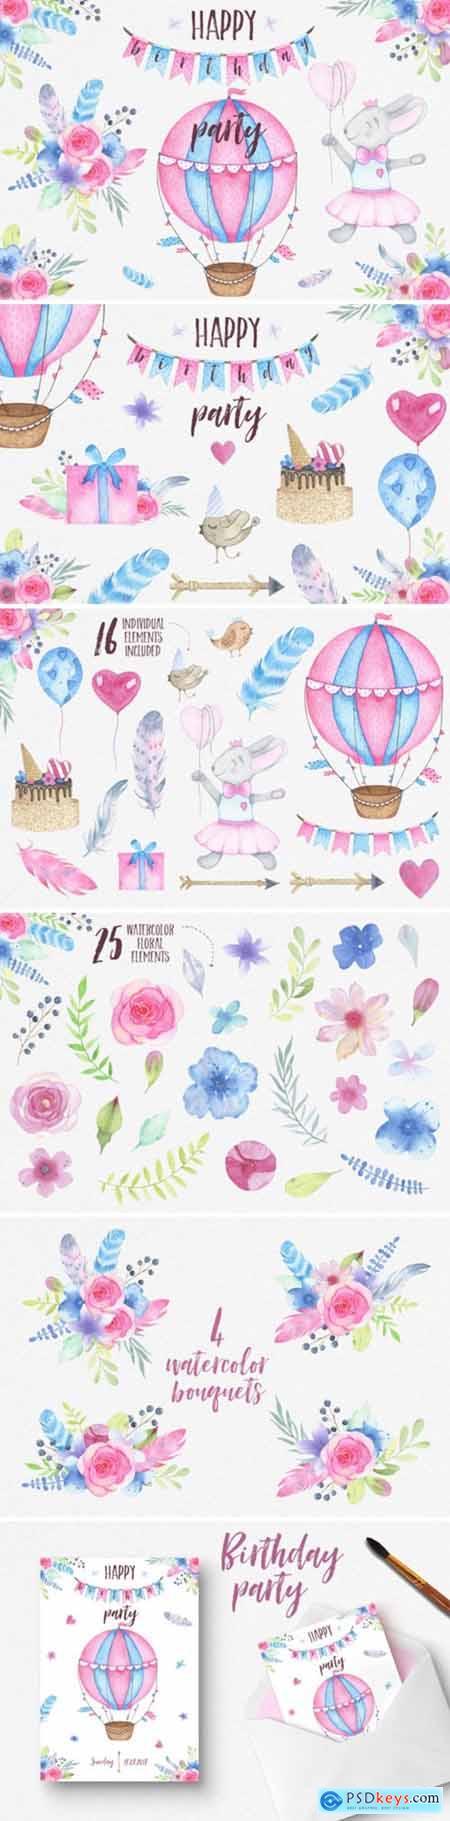 Watercolor Birthday Party 2194186